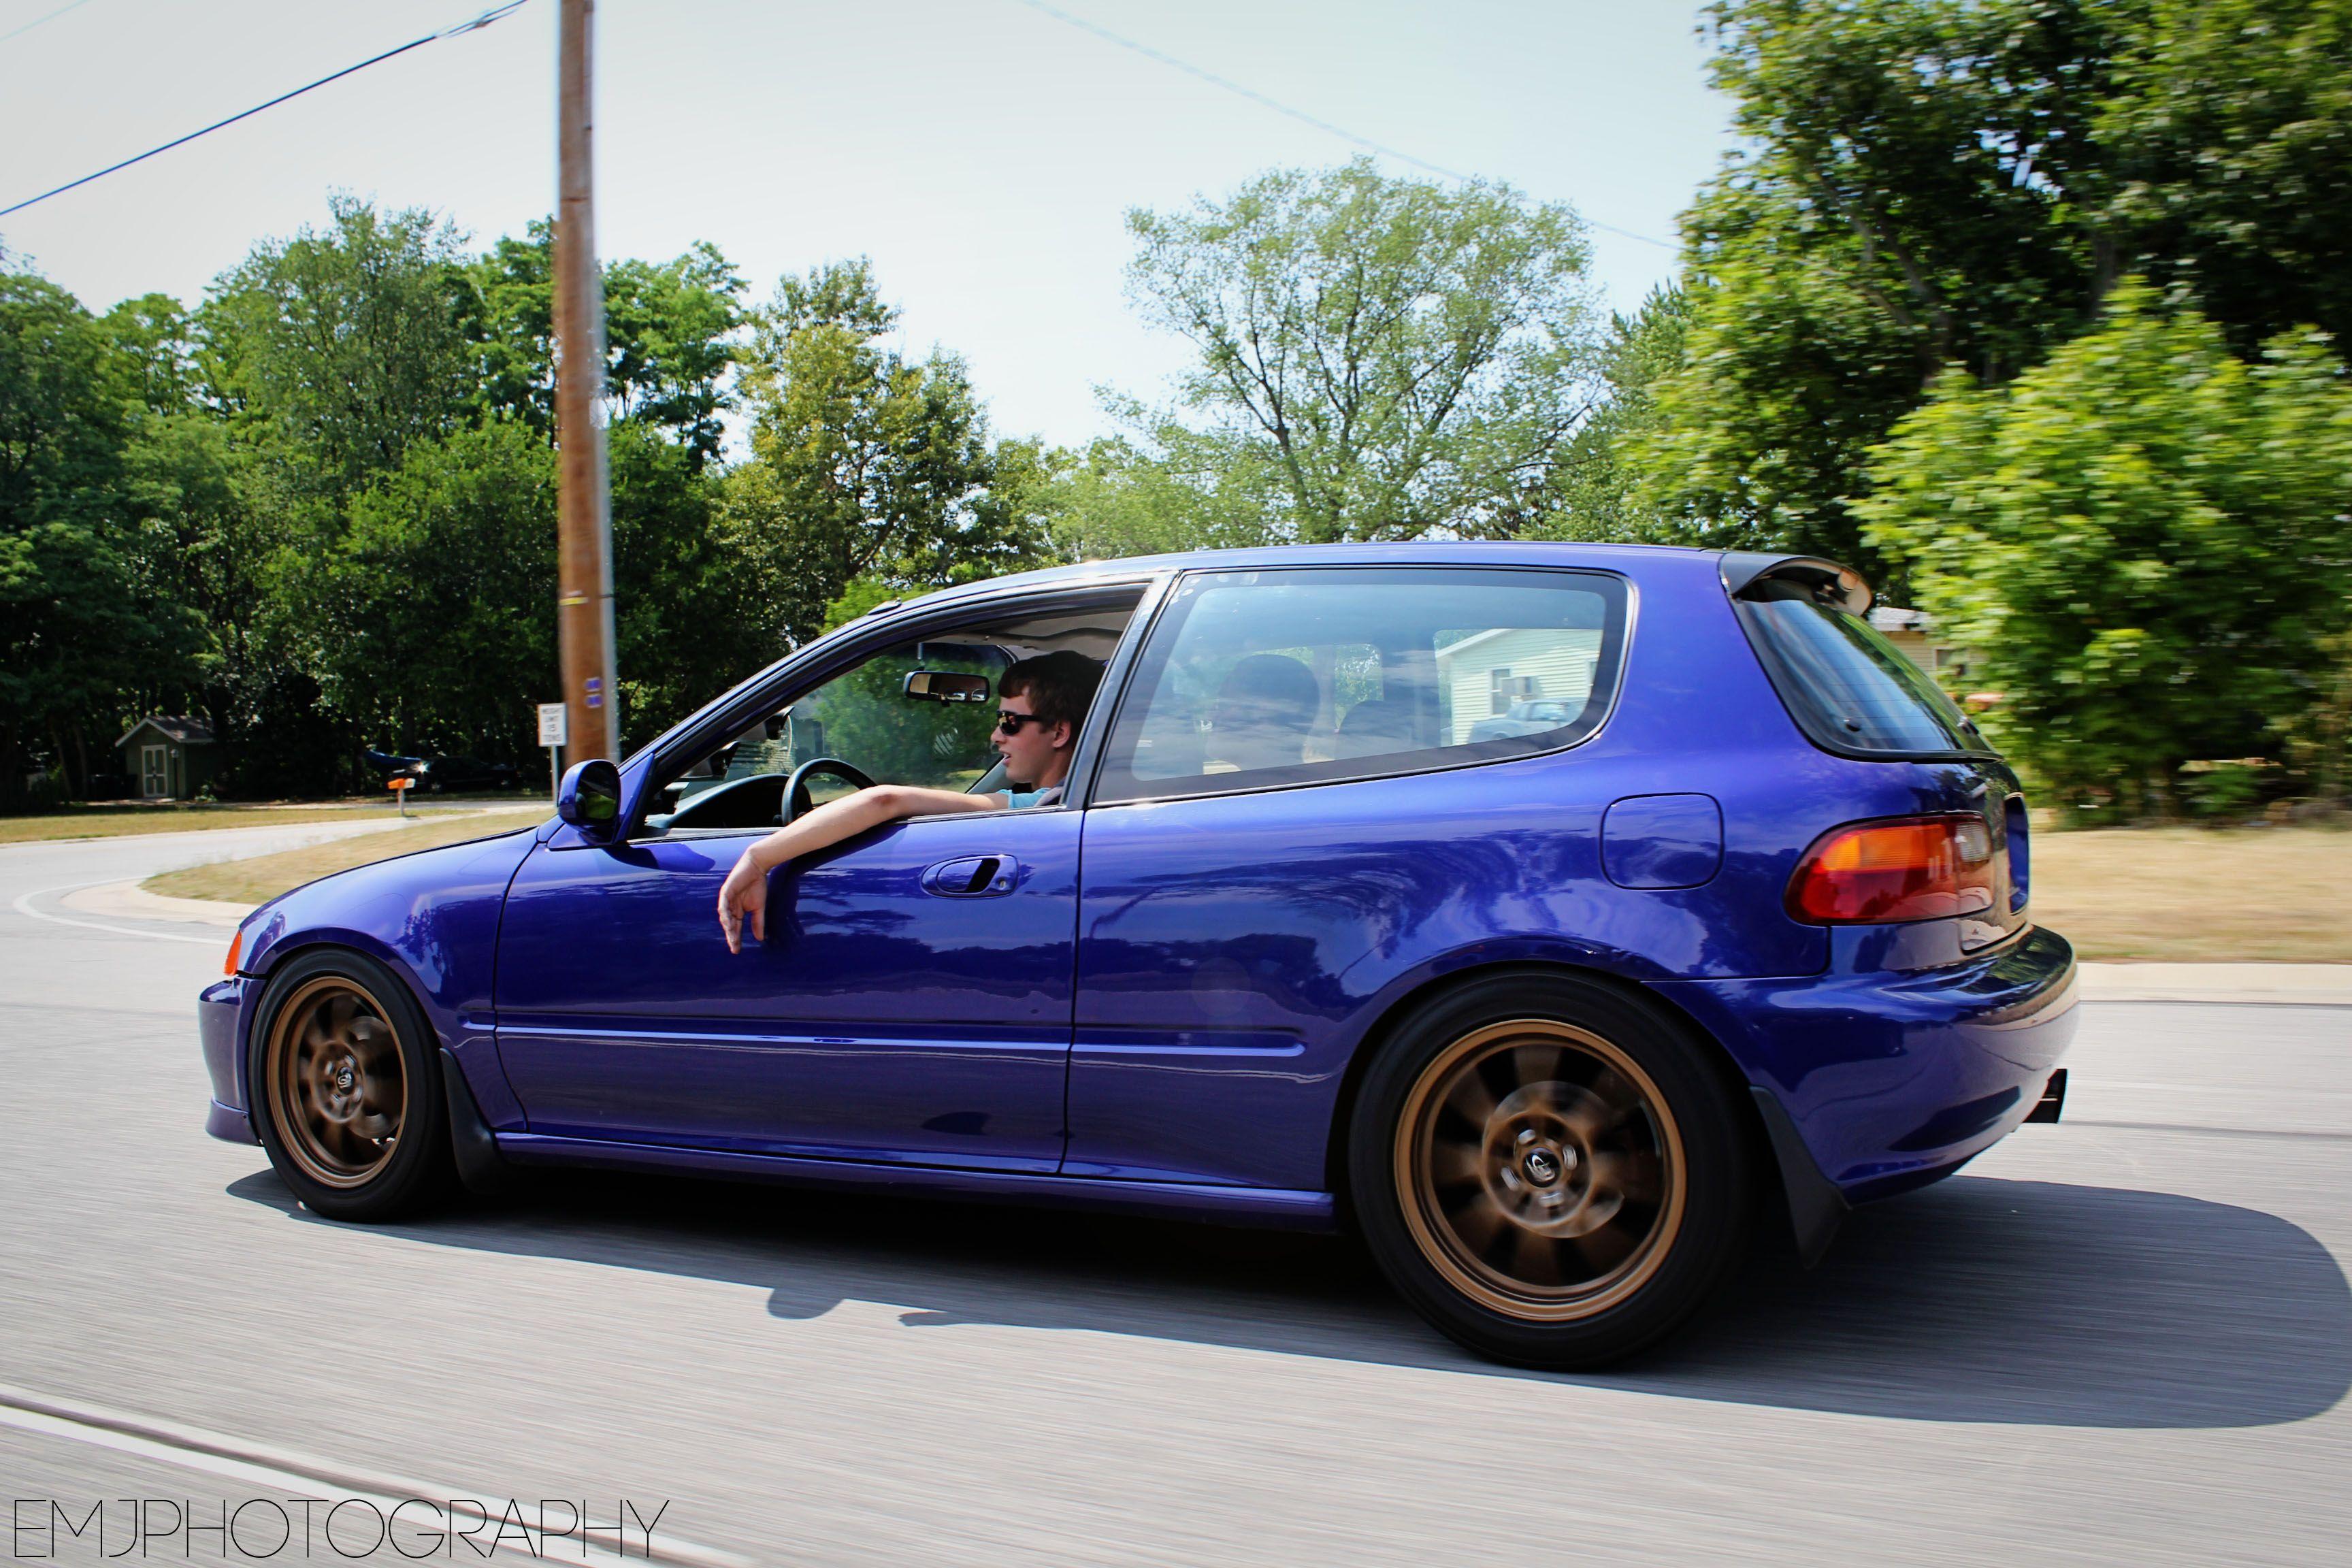 Type R Crv >> Honda Civic EG Hatch | Dc2 | Pinterest